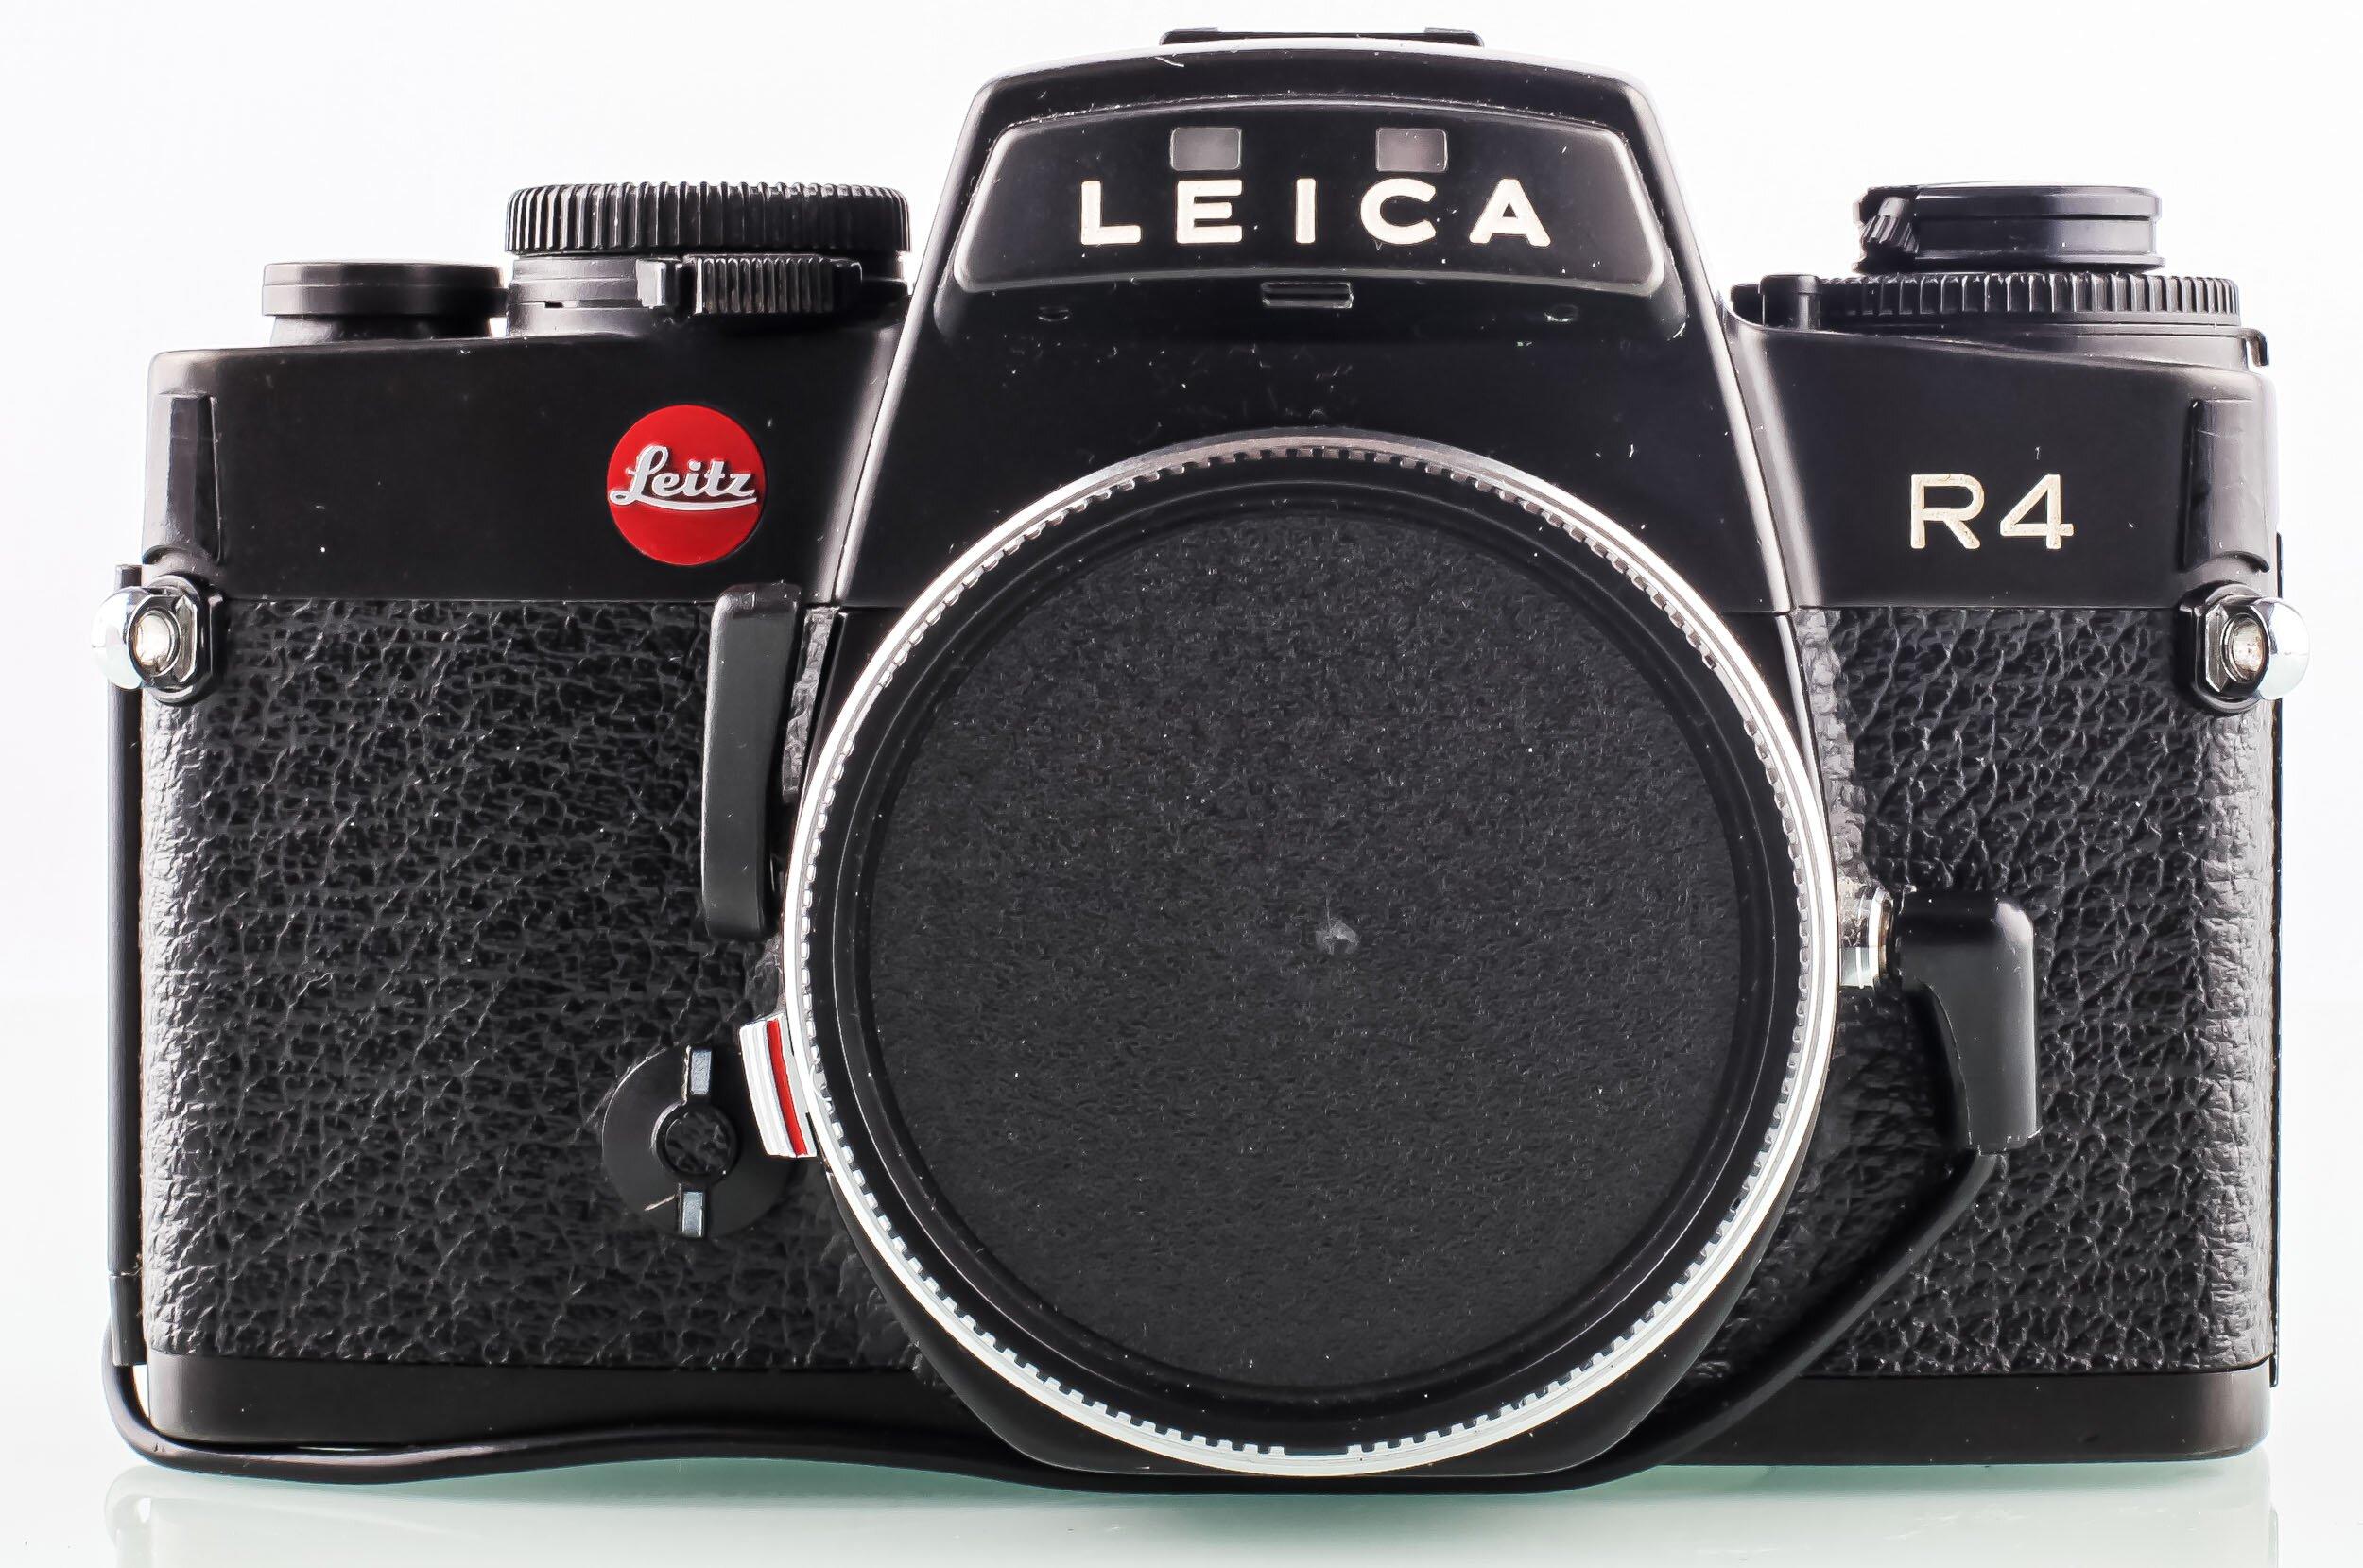 Leica R4 Gehäuse mit DB Rückwand